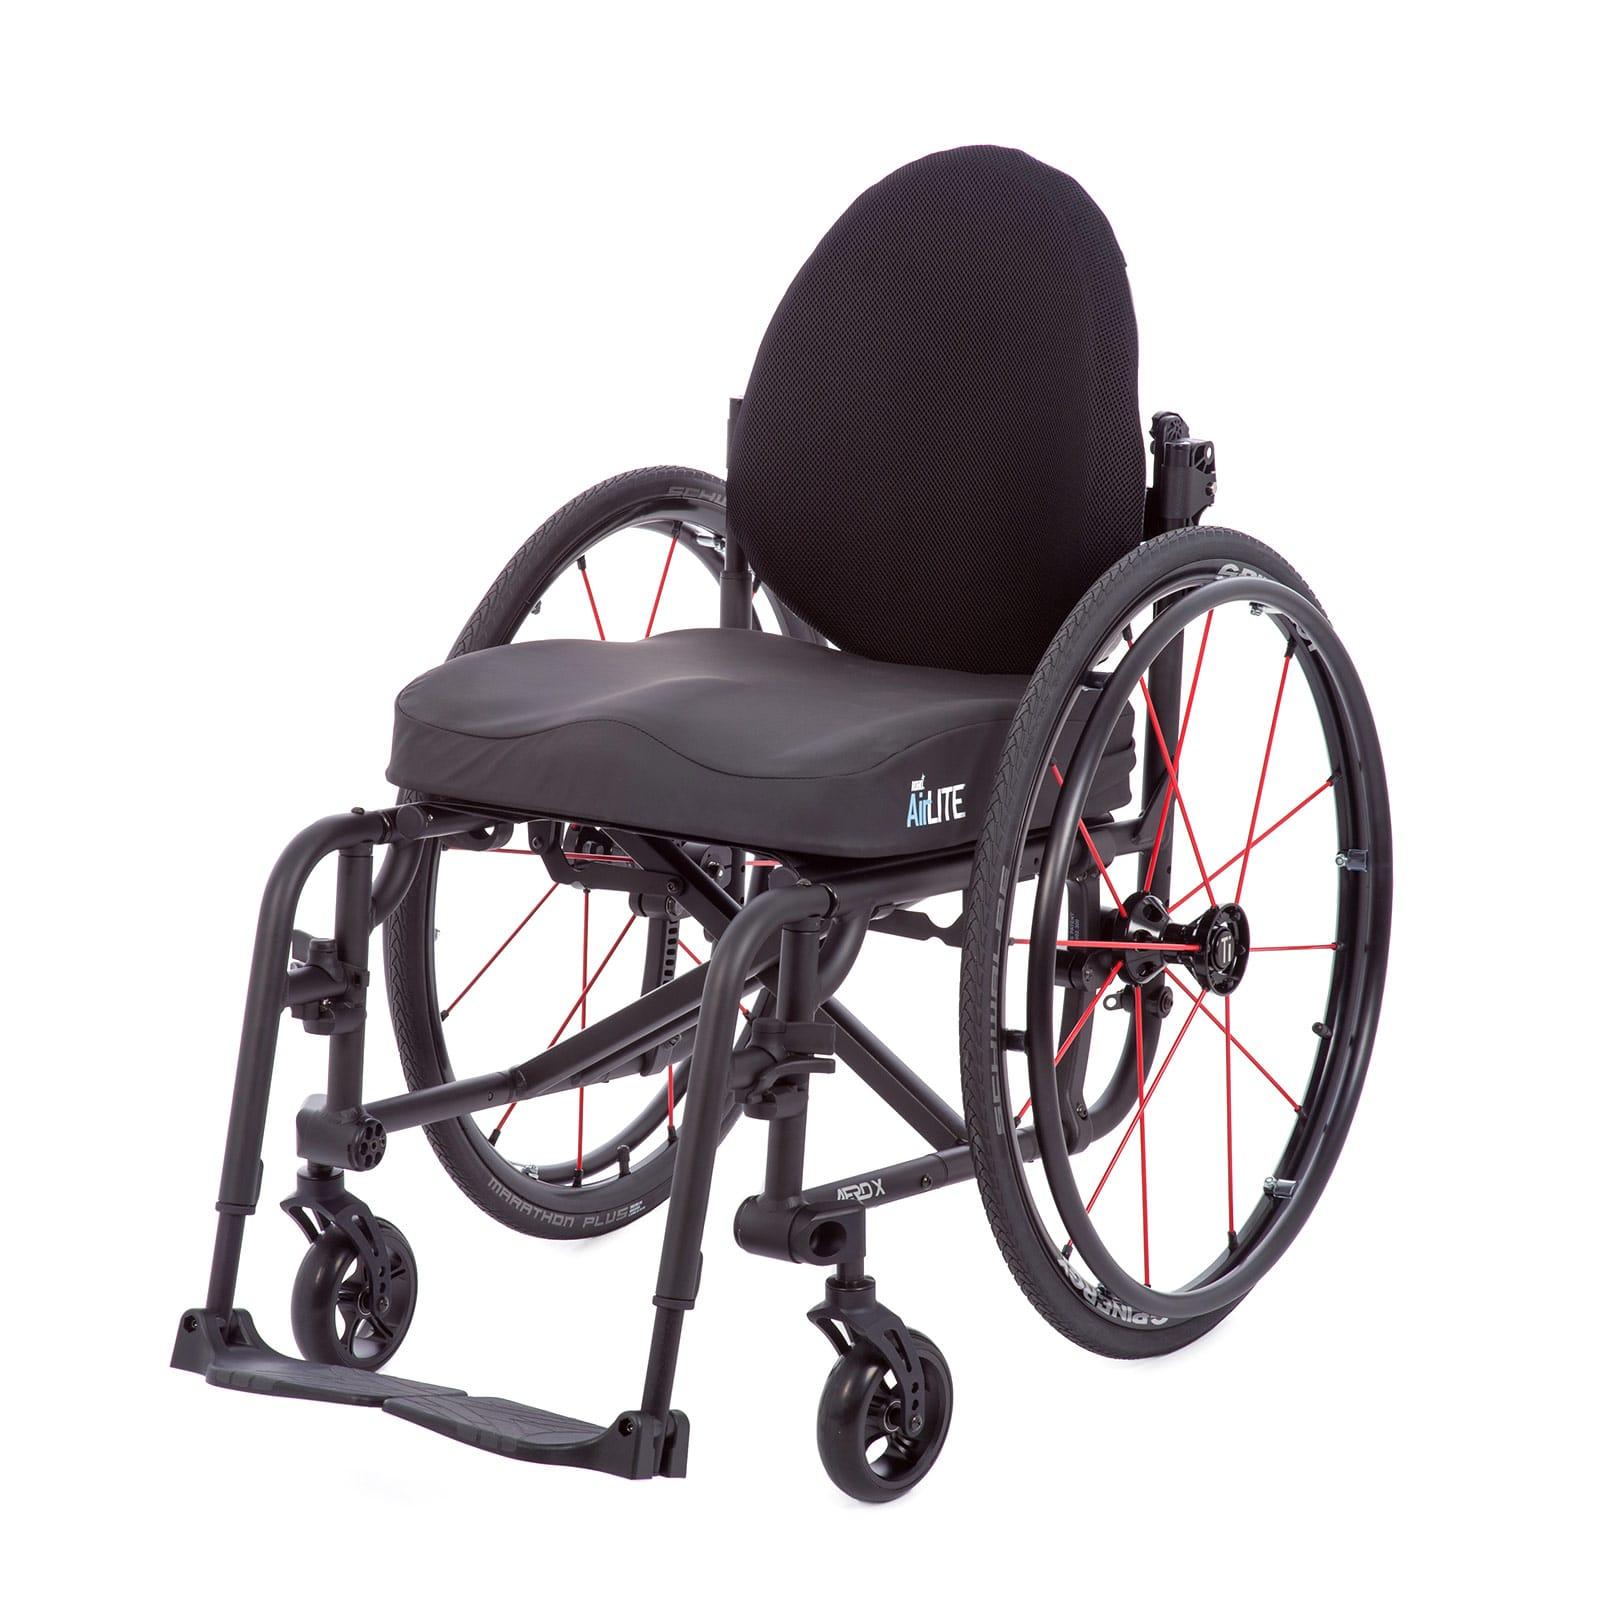 TiLite Aero X Manual Wheelchair